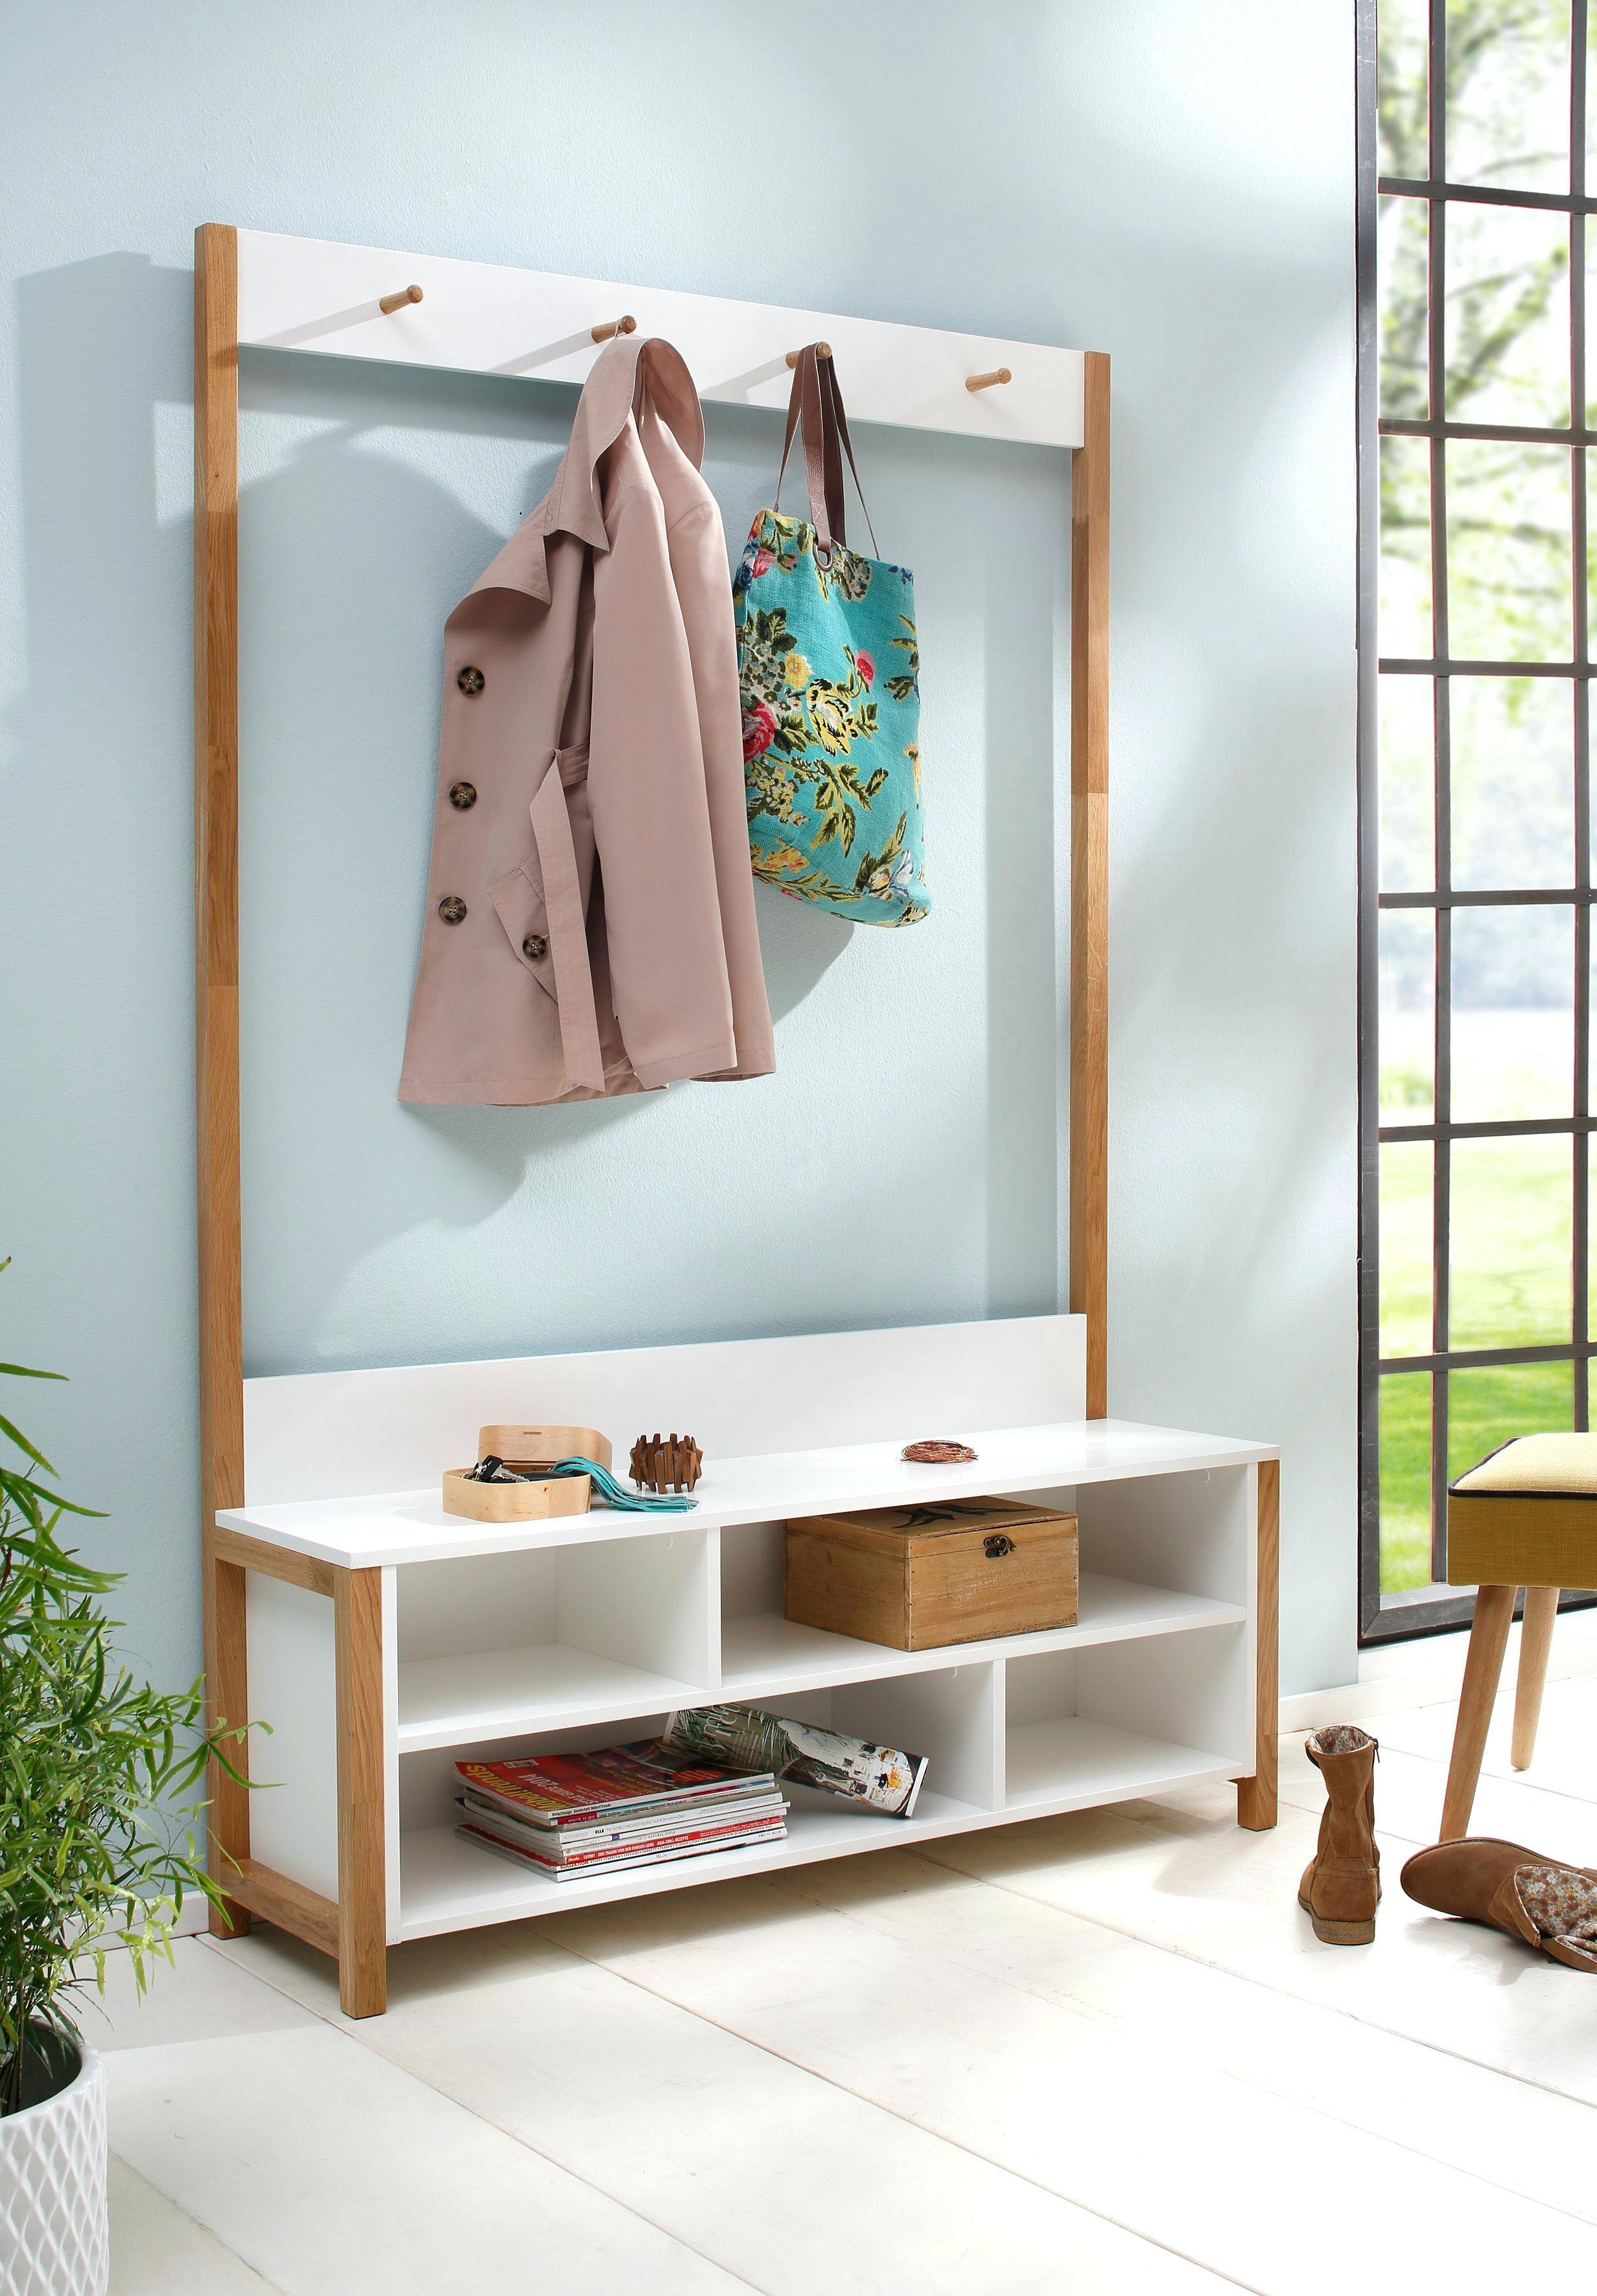 14 Quality Kindergarderobe Mit Bank Brass Wall Hook Wall Hanger Towel Hooks